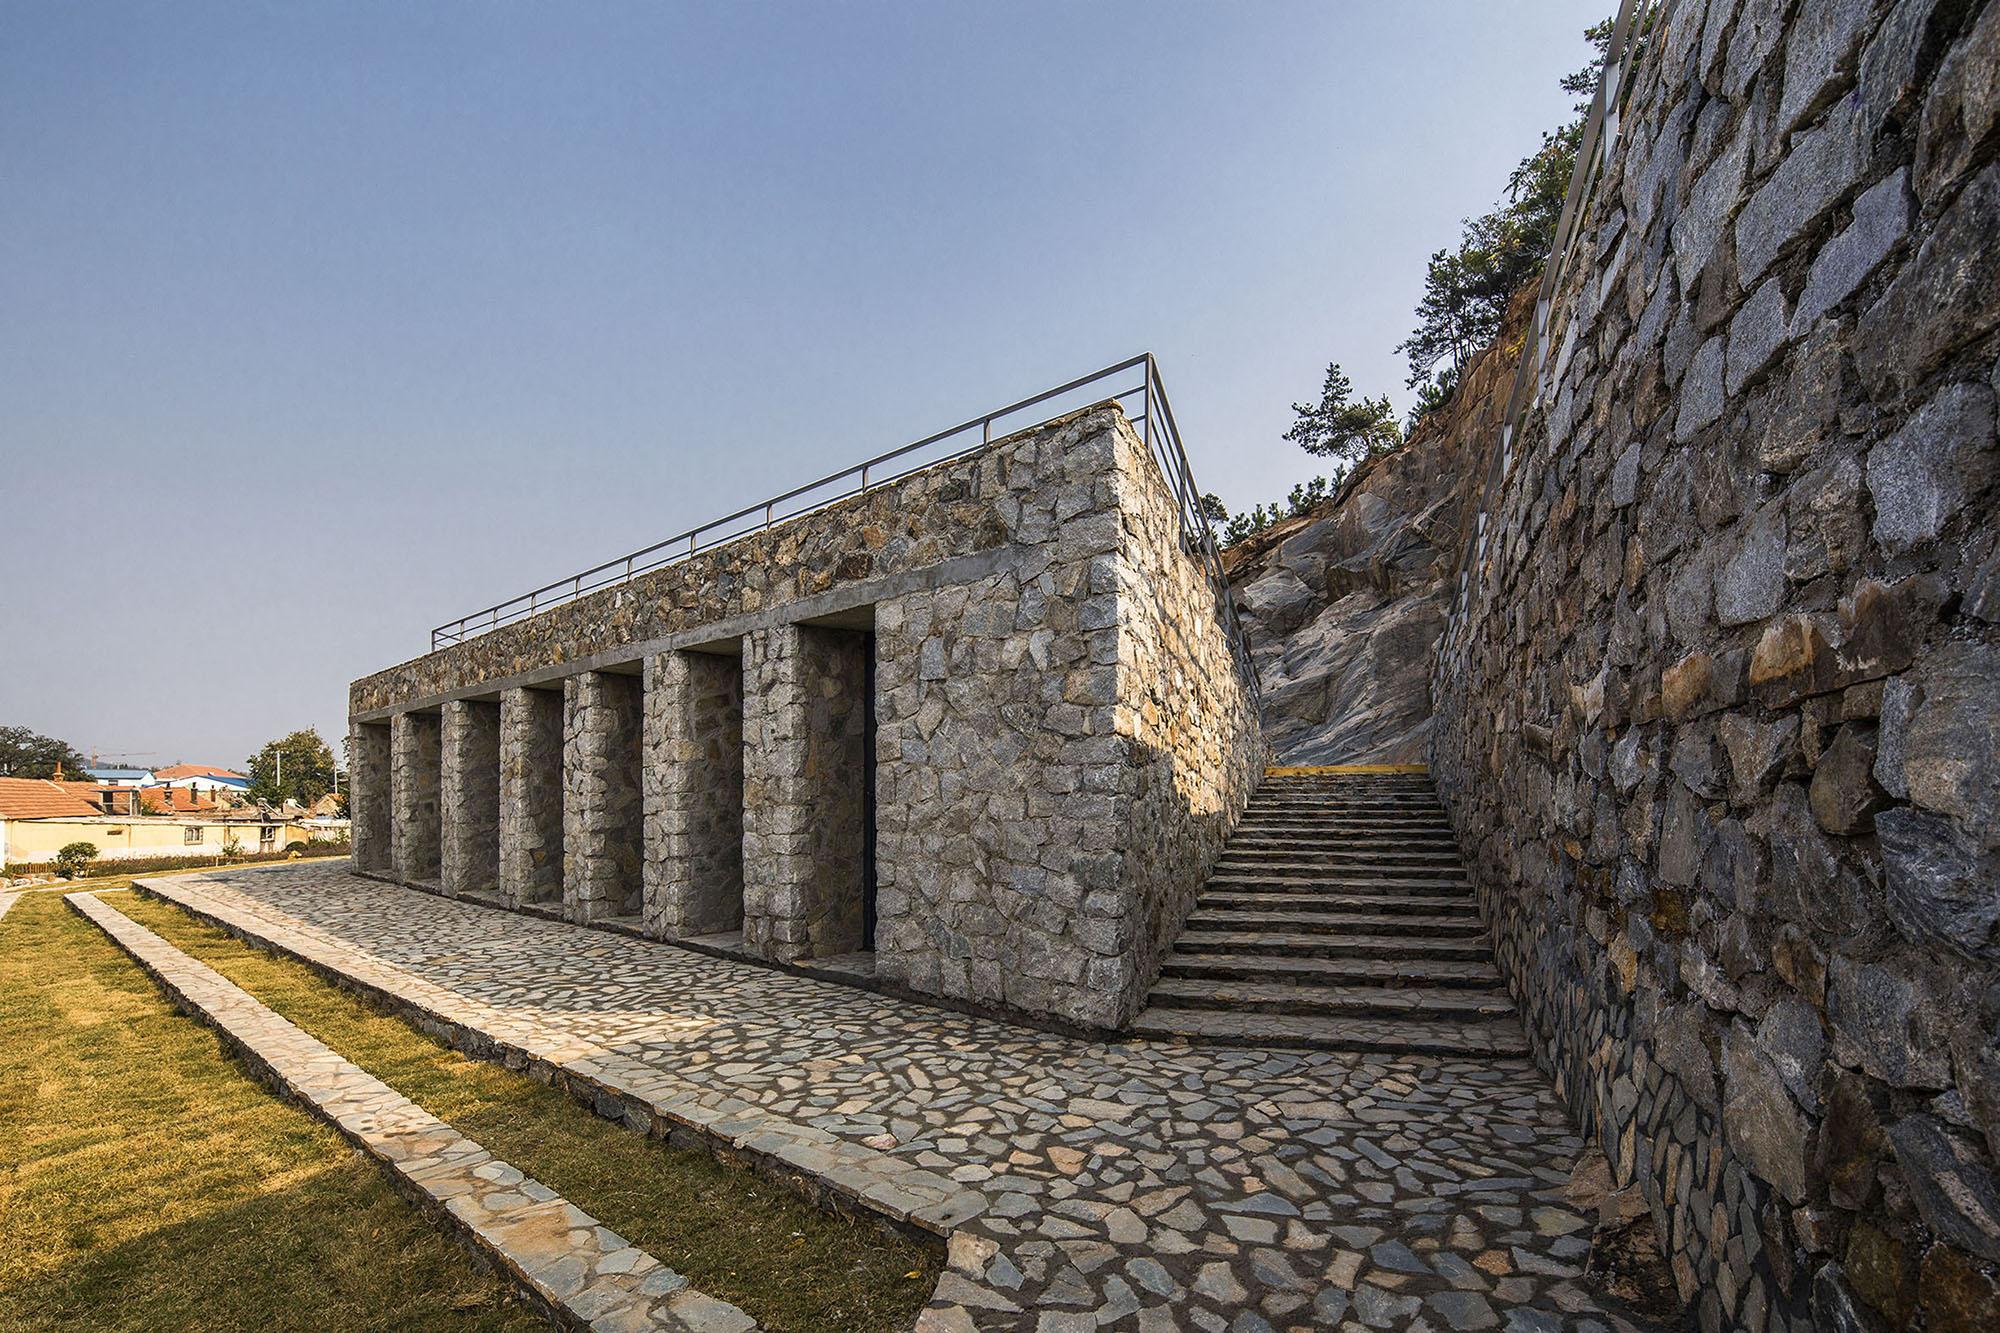 3andwich Design / He Wei Studio - Stone Nest Amphitheatre - Photo by JIN Weiqi